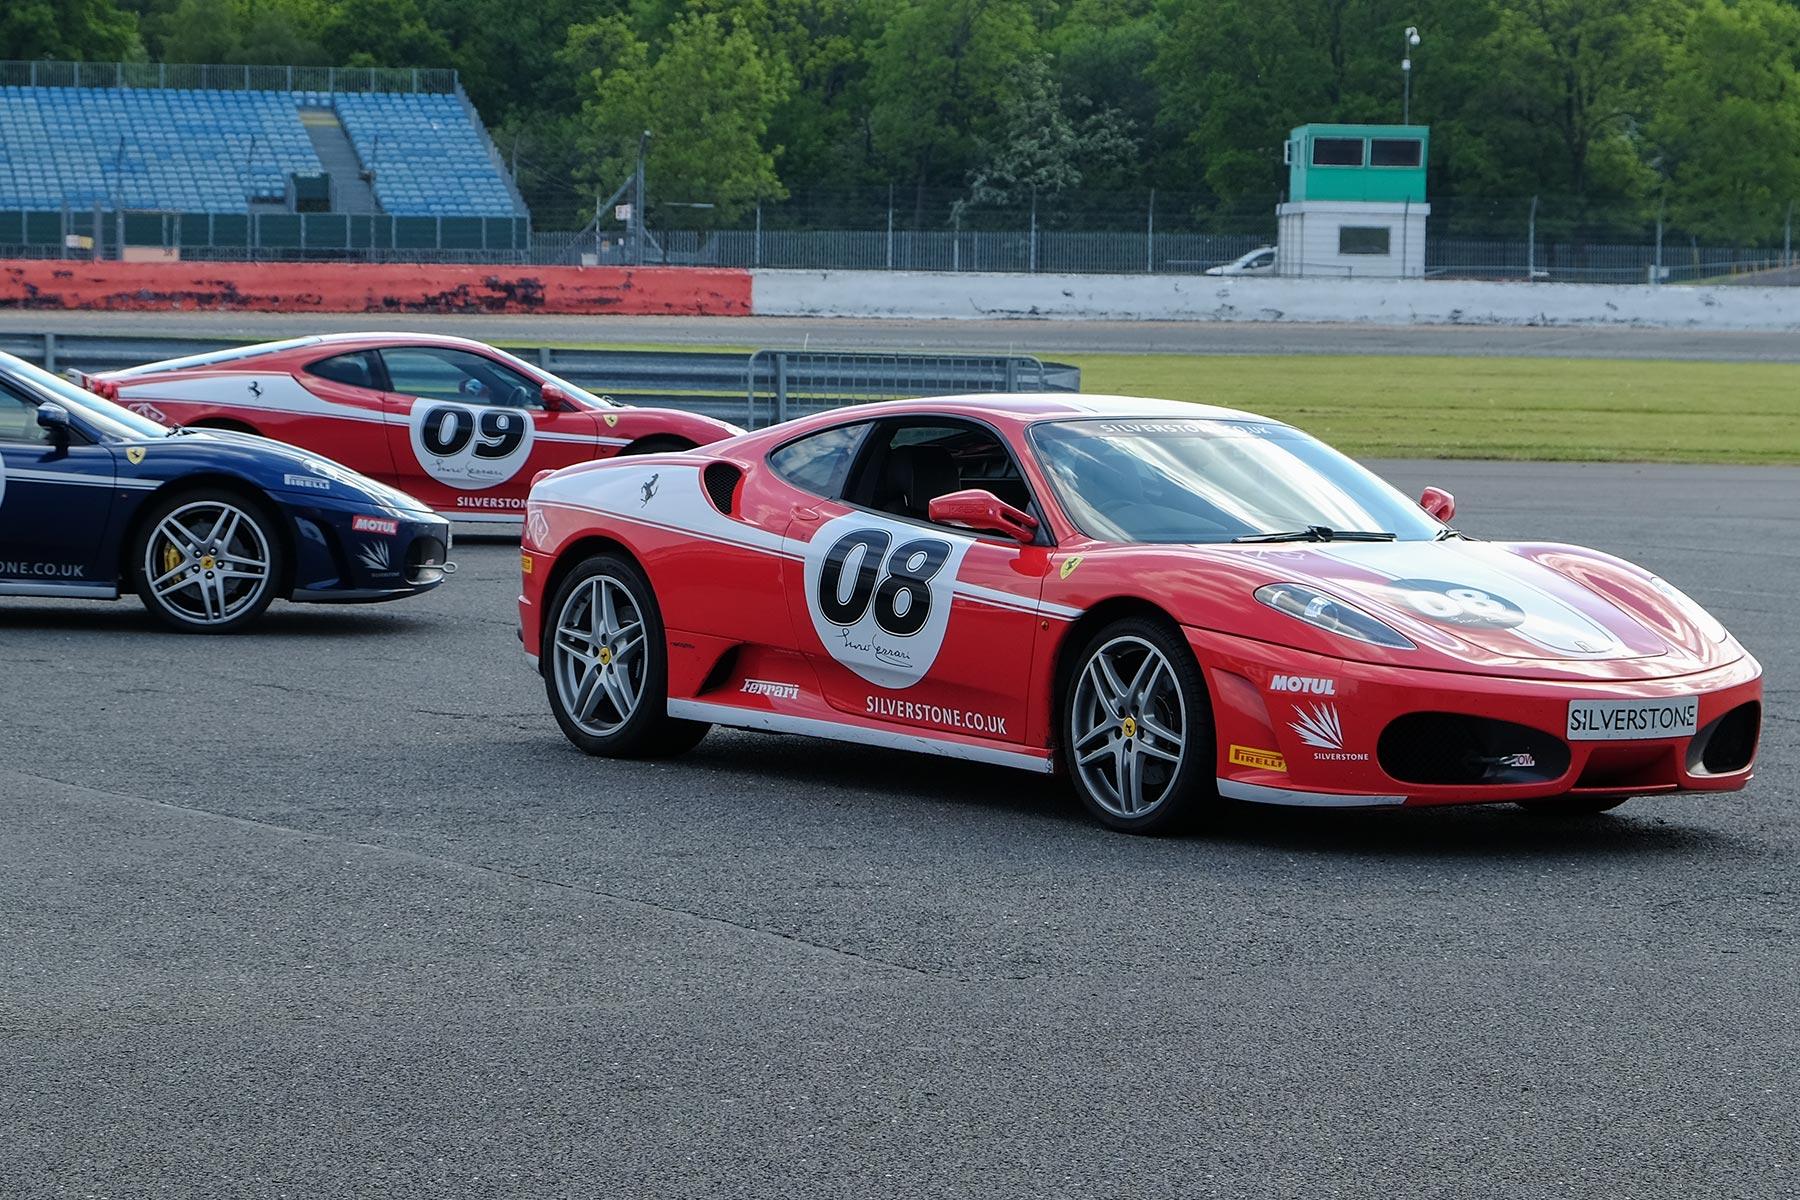 Ferrari F430 Experience Autos in Silverstone